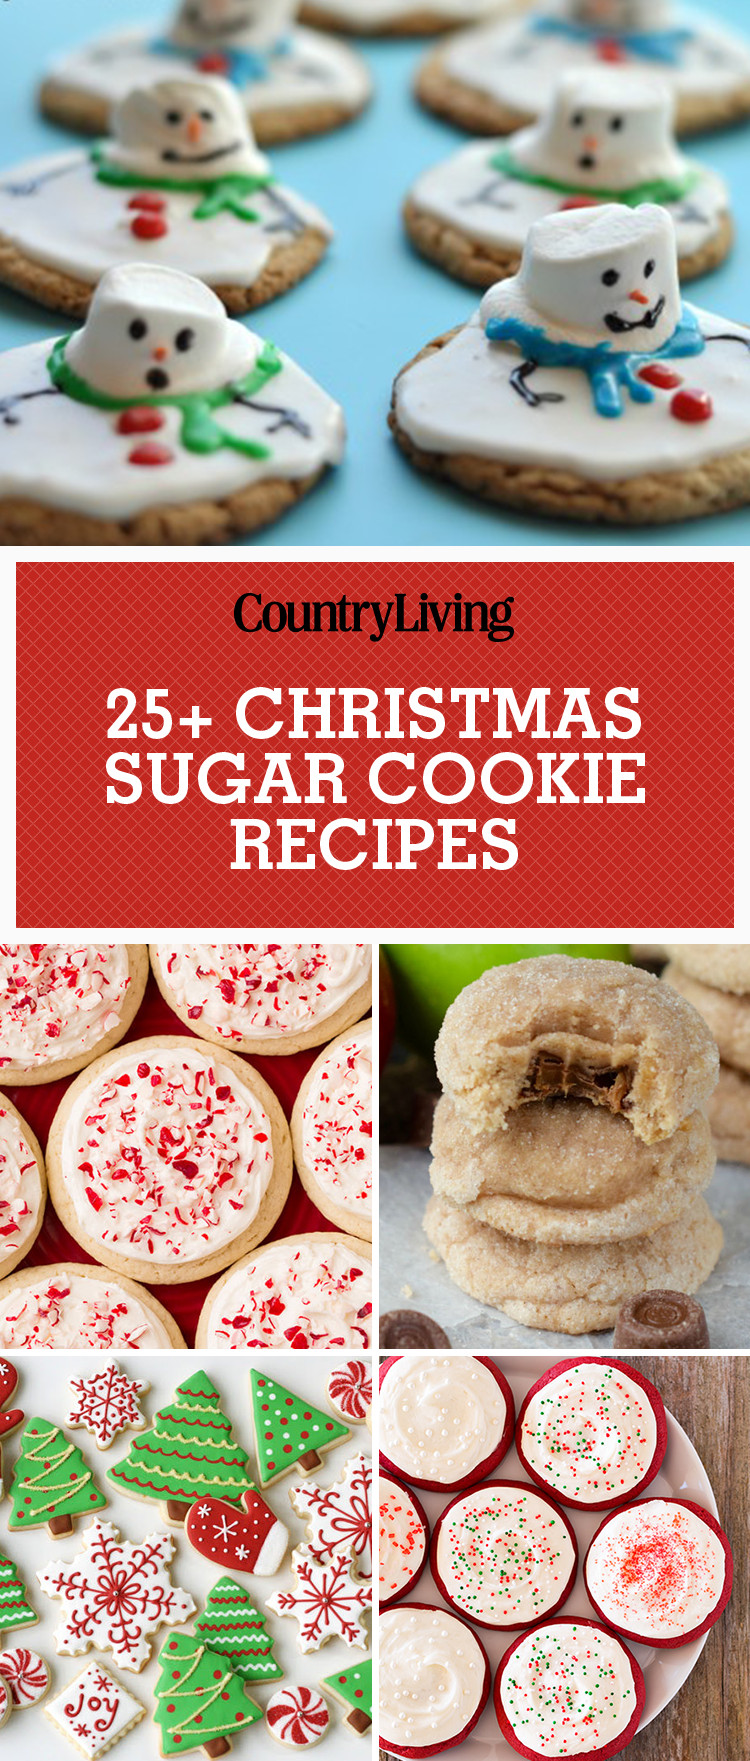 Christmas Sugar Cookies Recipe  25 Easy Christmas Sugar Cookies Recipes & Decorating